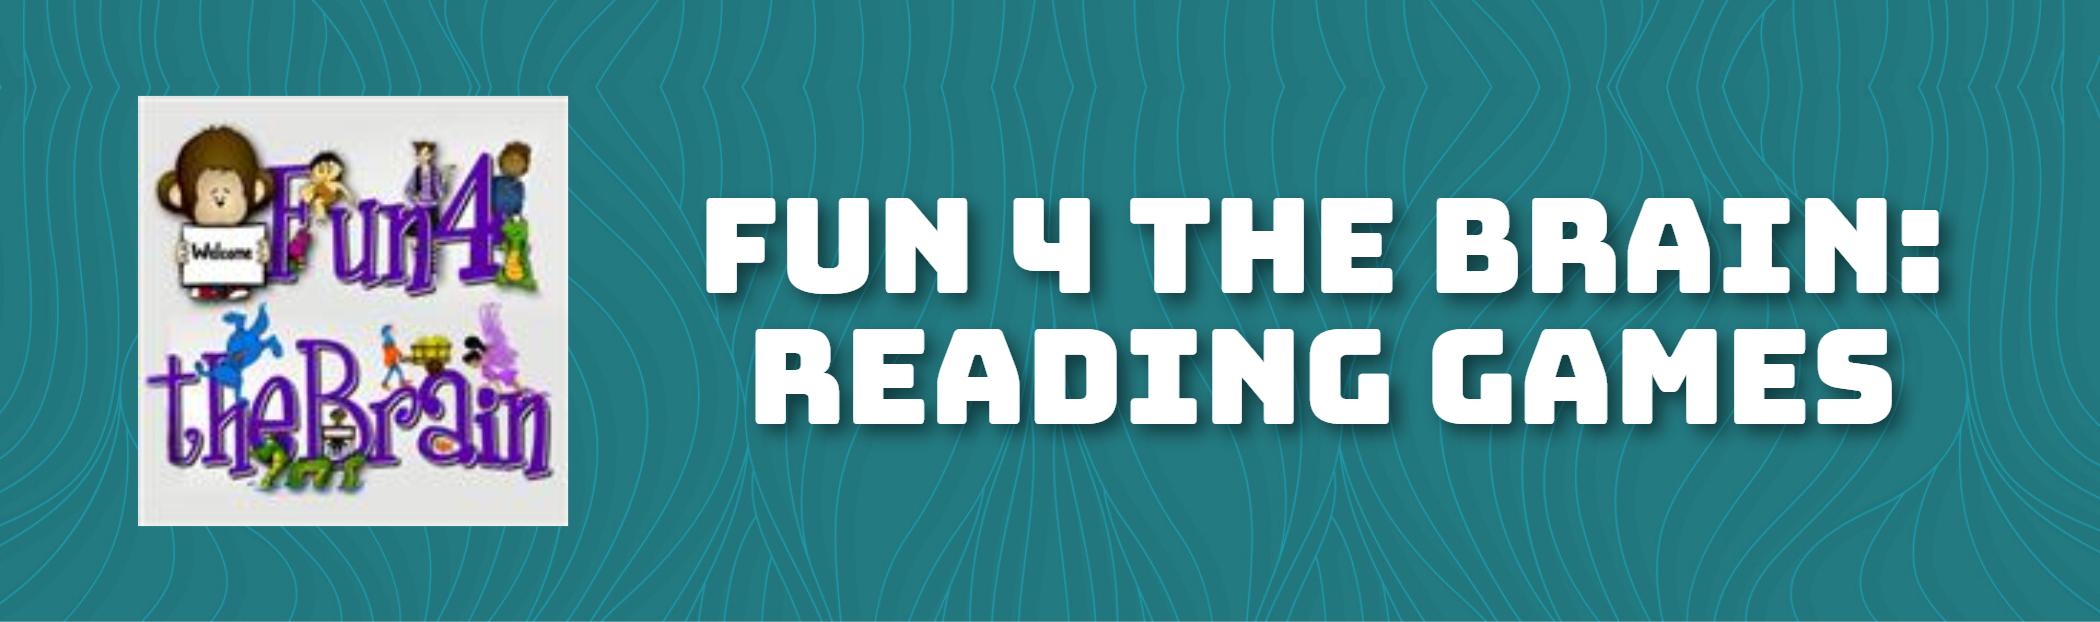 FUN 4 THE BRAIN: READING GAMES